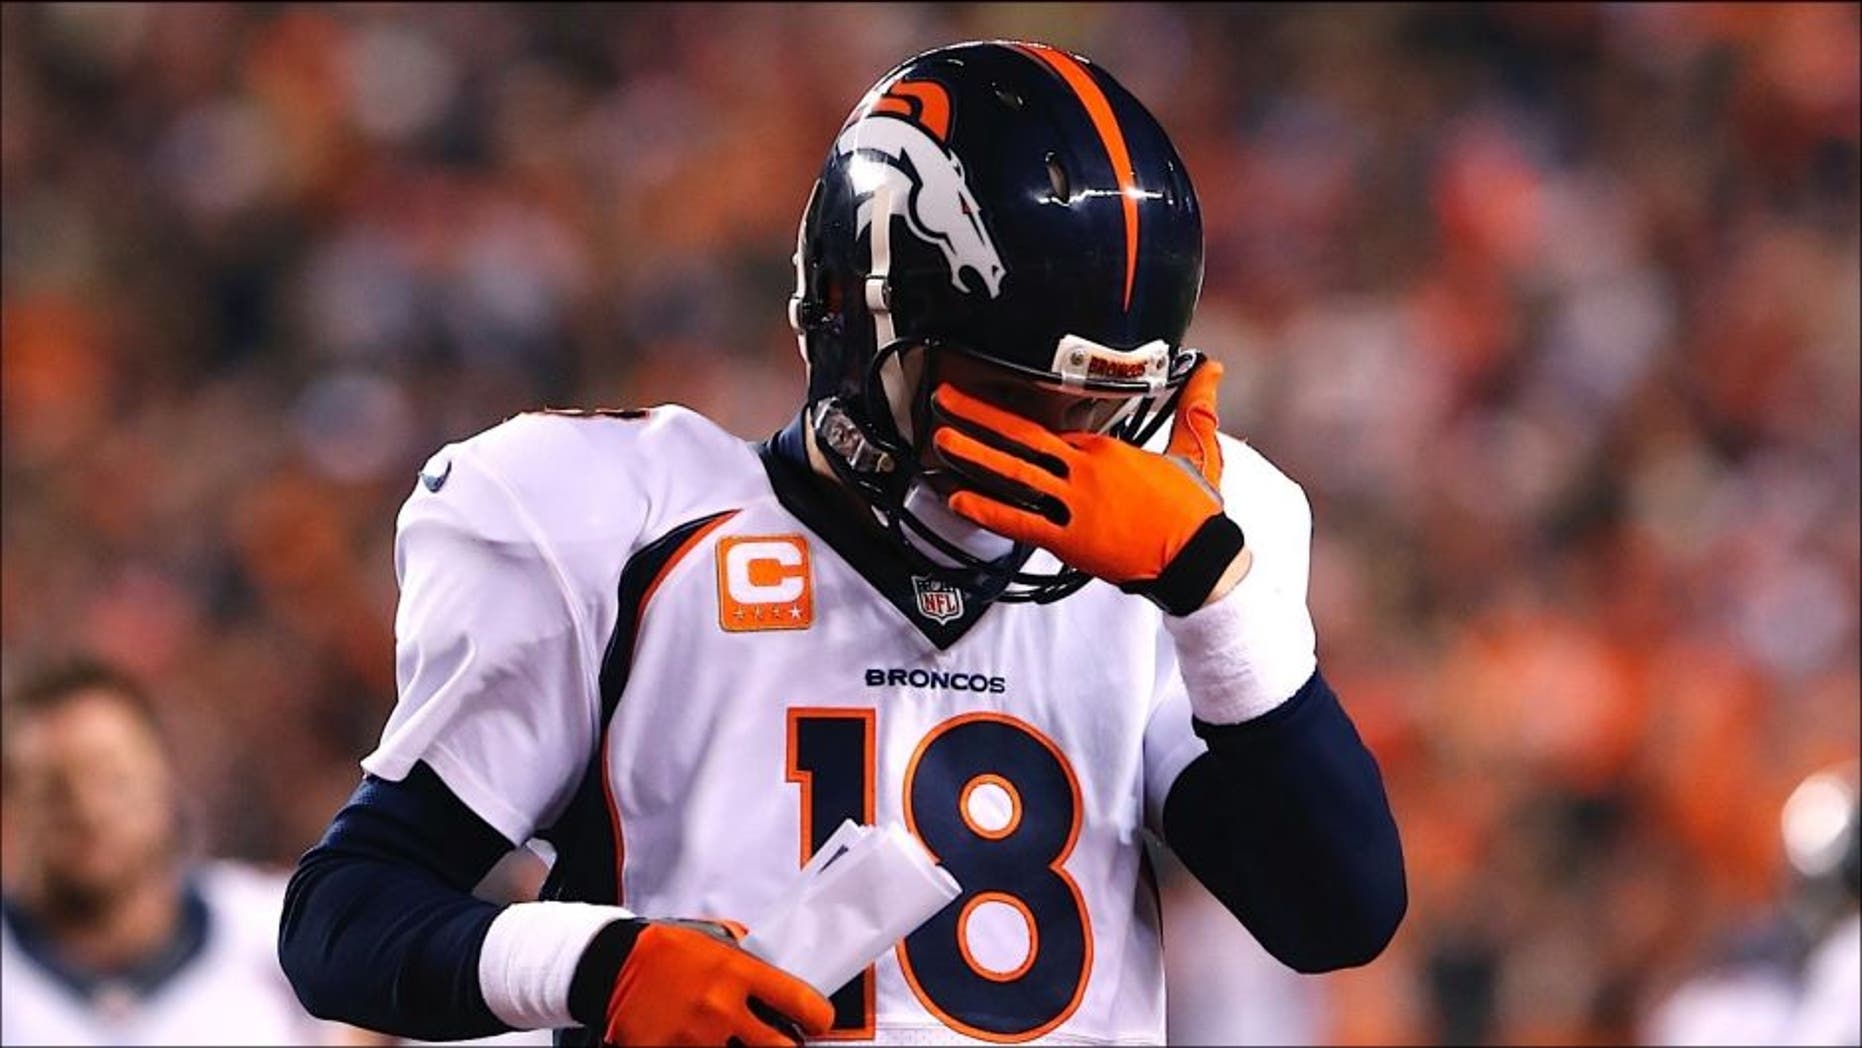 Dec 22, 2014; Cincinnati, OH, USA; Denver Broncos quarterback Peyton Manning (18) walks off the field at halftime against the Cincinnati Bengals at Paul Brown Stadium. Mandatory Credit: Aaron Doster-USA TODAY Sports